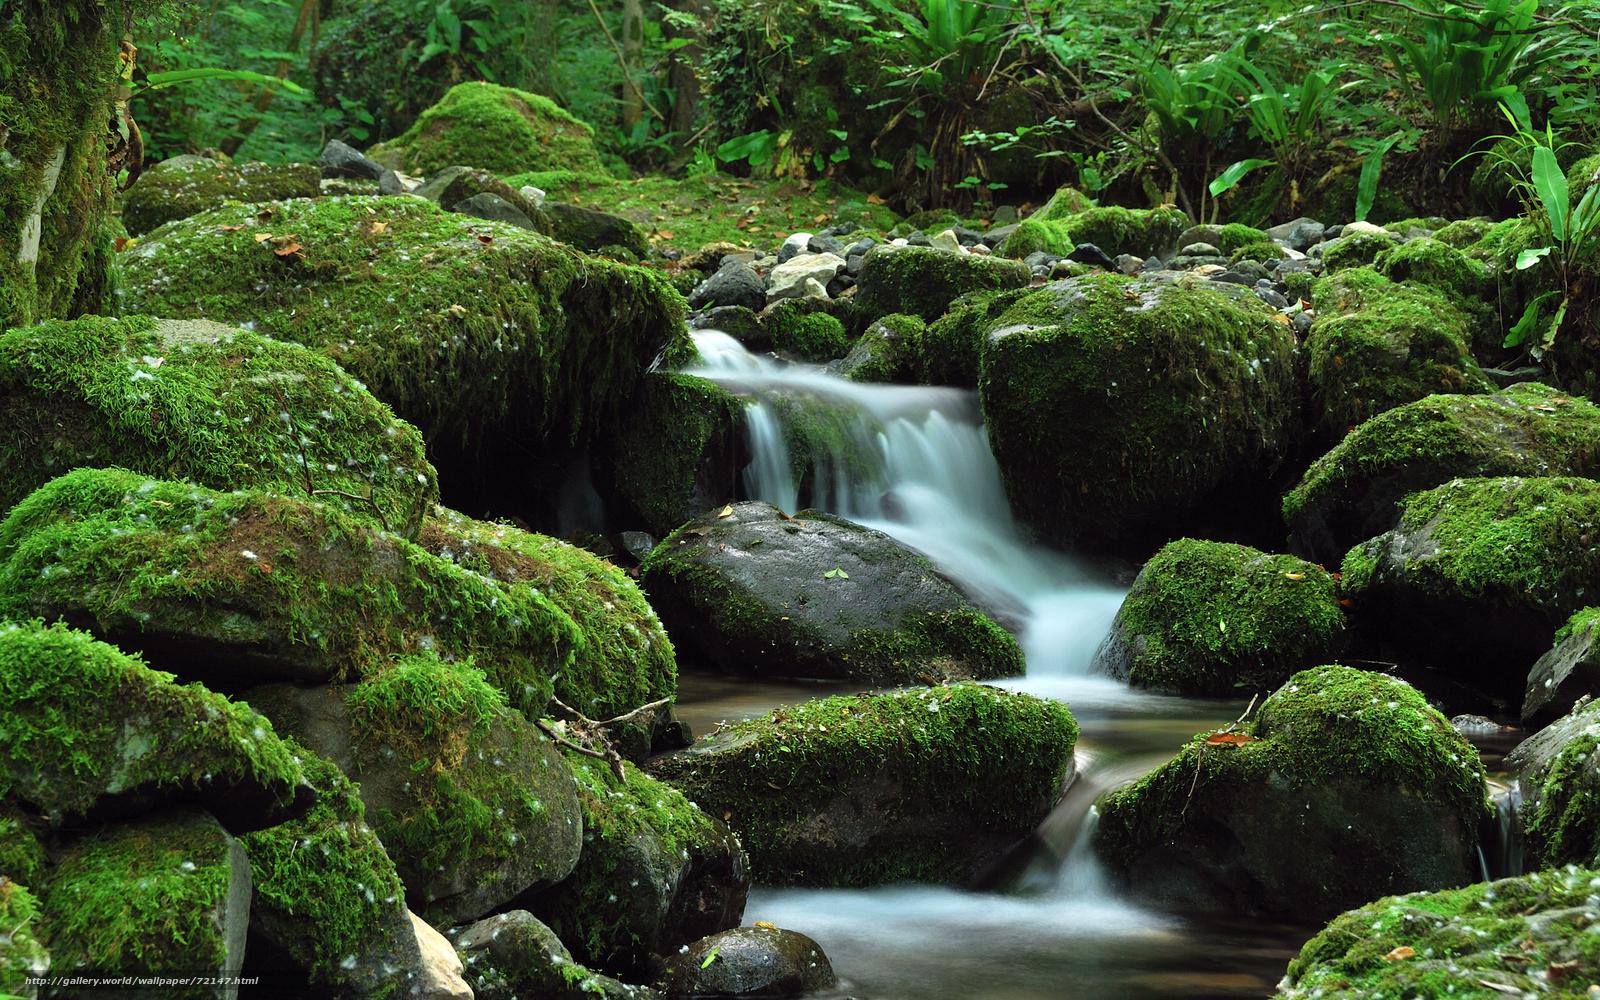 Tlcharger fond d 39 ecran lgumes verts noyaux cascade for Jardin japonais fond d ecran